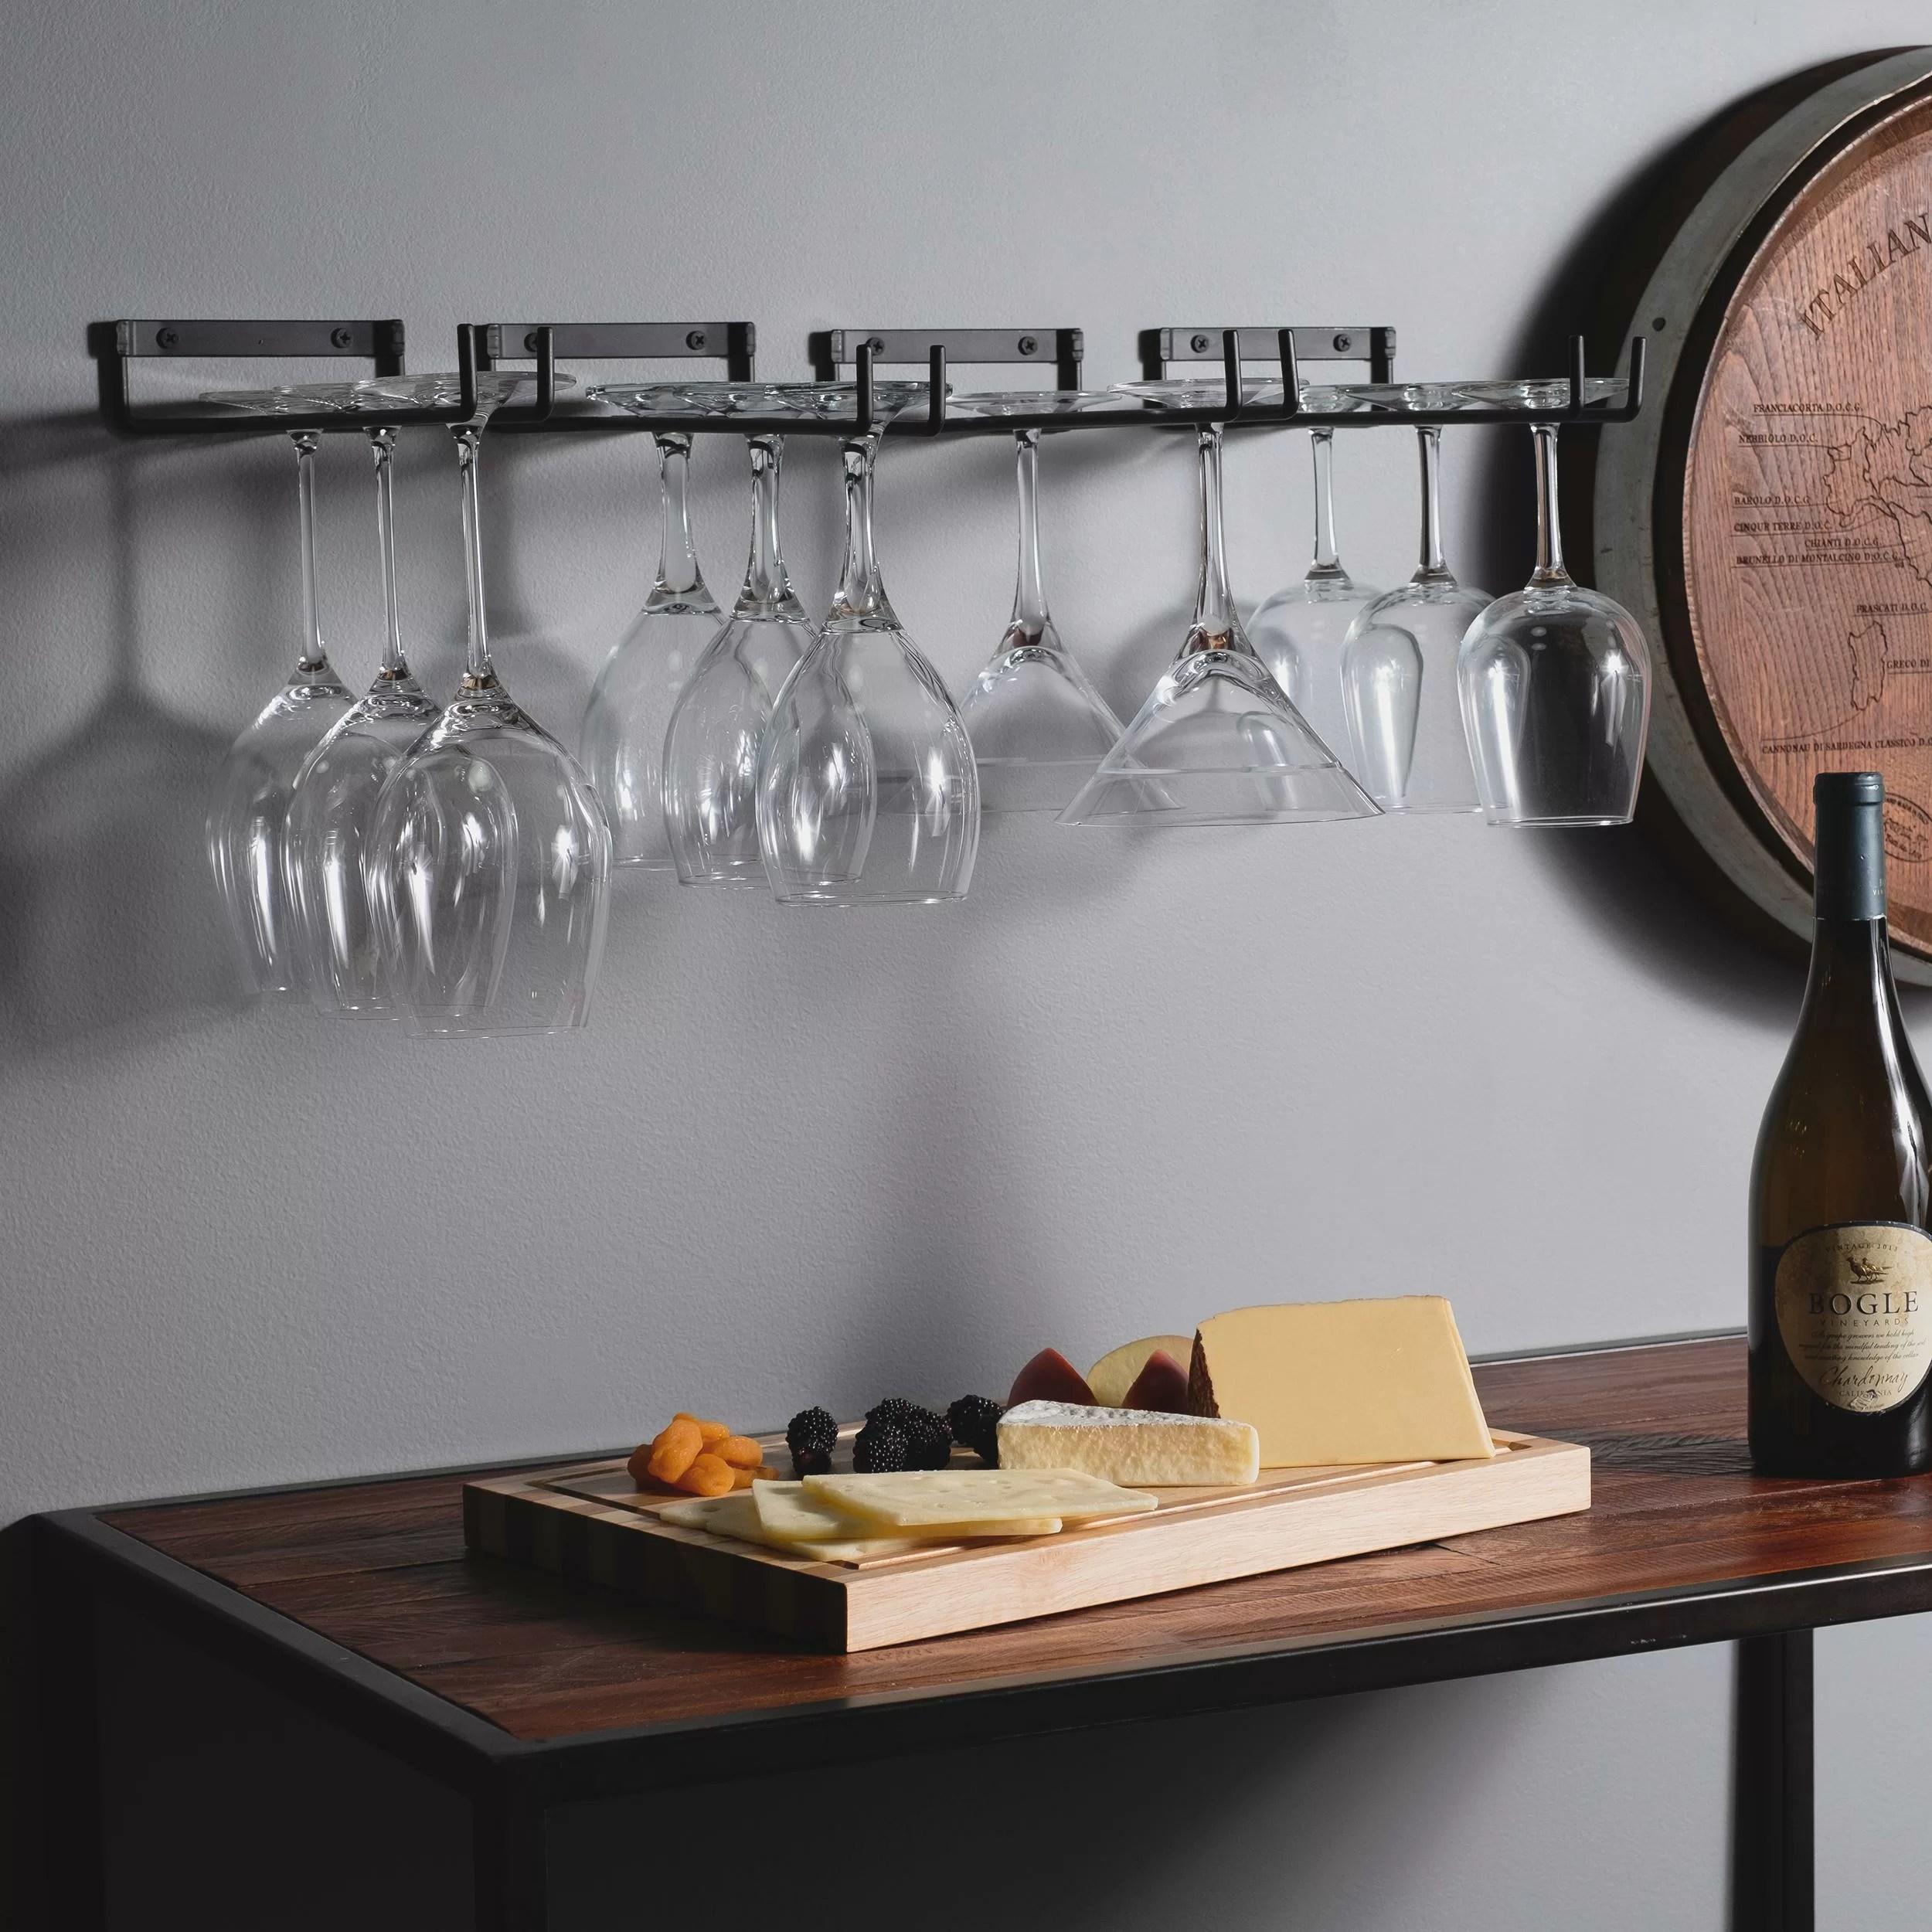 wellman chiraz hanging wine glass rack